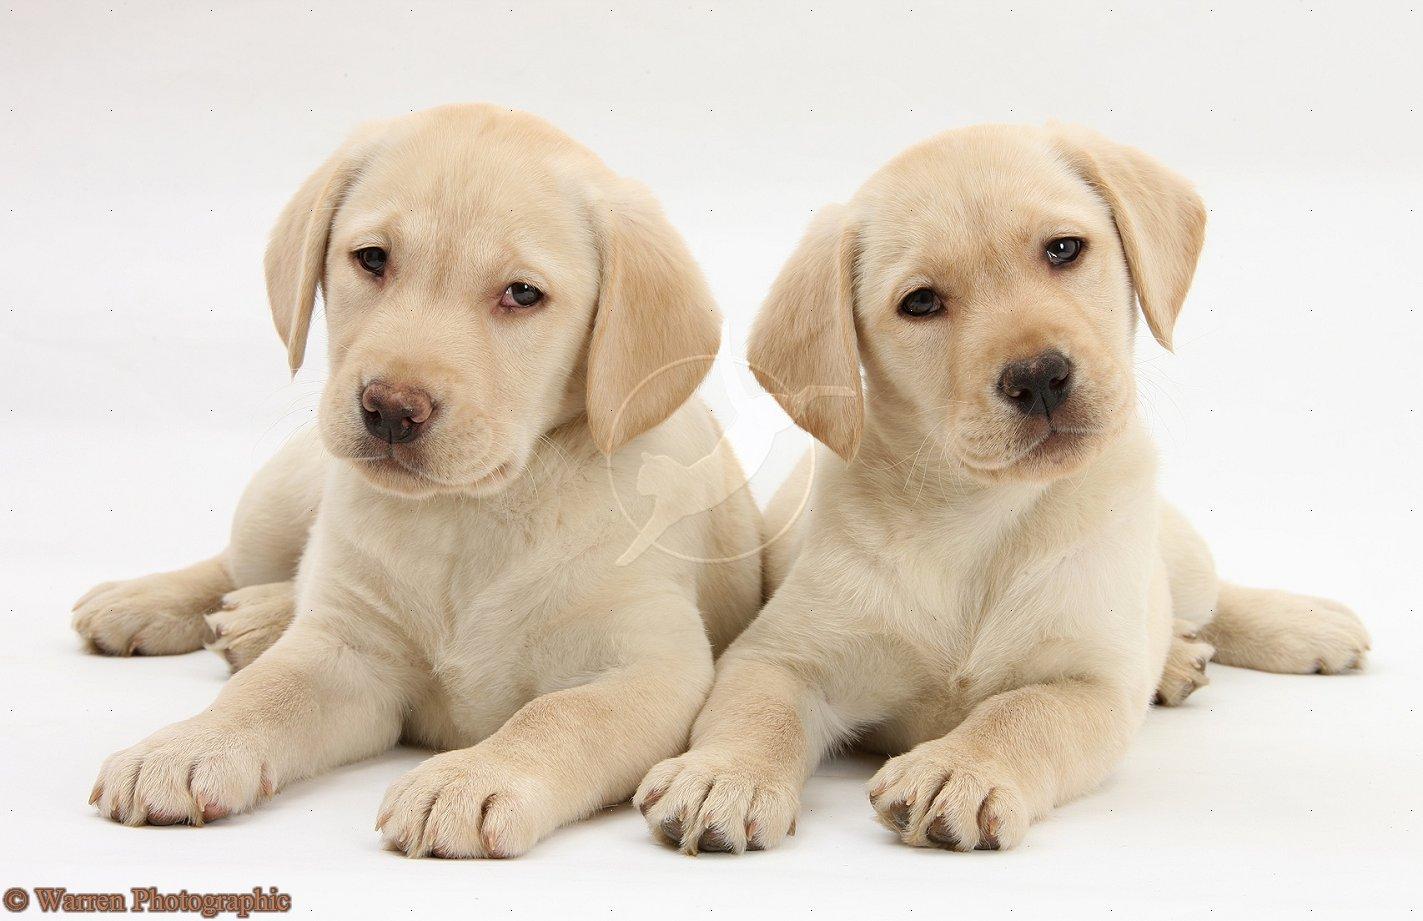 Yellow Labrador Retriever puppies 9 weeks old white background 1423x921